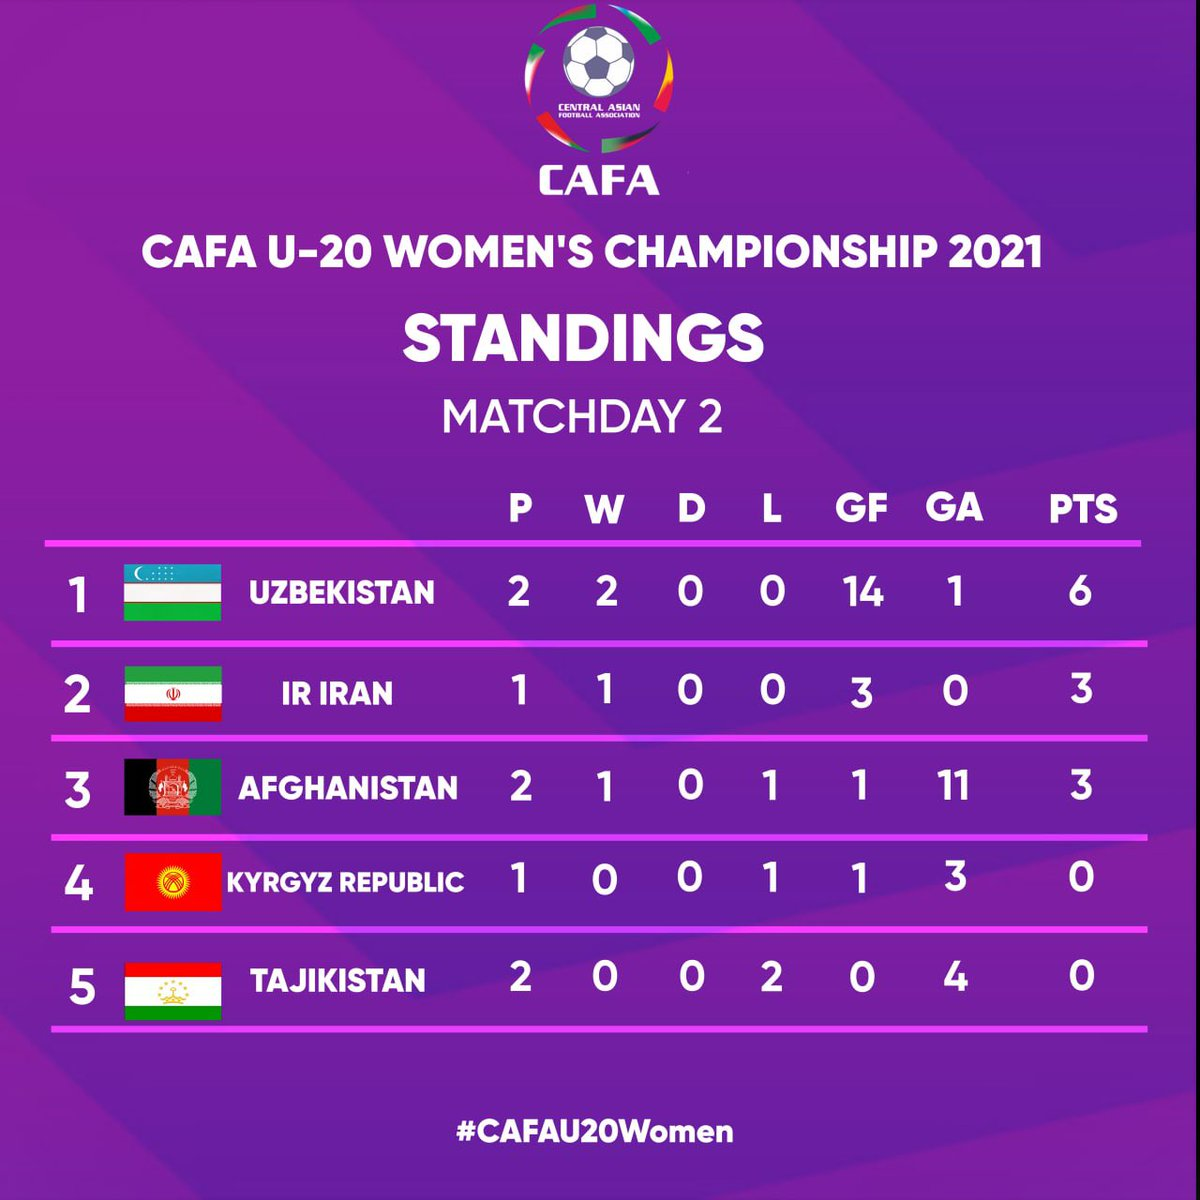 CAFA U-20 WOMEN'S CHAMPIONSHIP 2021 TAJIKISTAN   Standings after the Matchday 2  @cafassociation   #CAFAU20Women #Afghanistan #Iran #KyrgyzRepublic #Tajikistan #Uzbekistan https://t.co/VxDgEAP32K